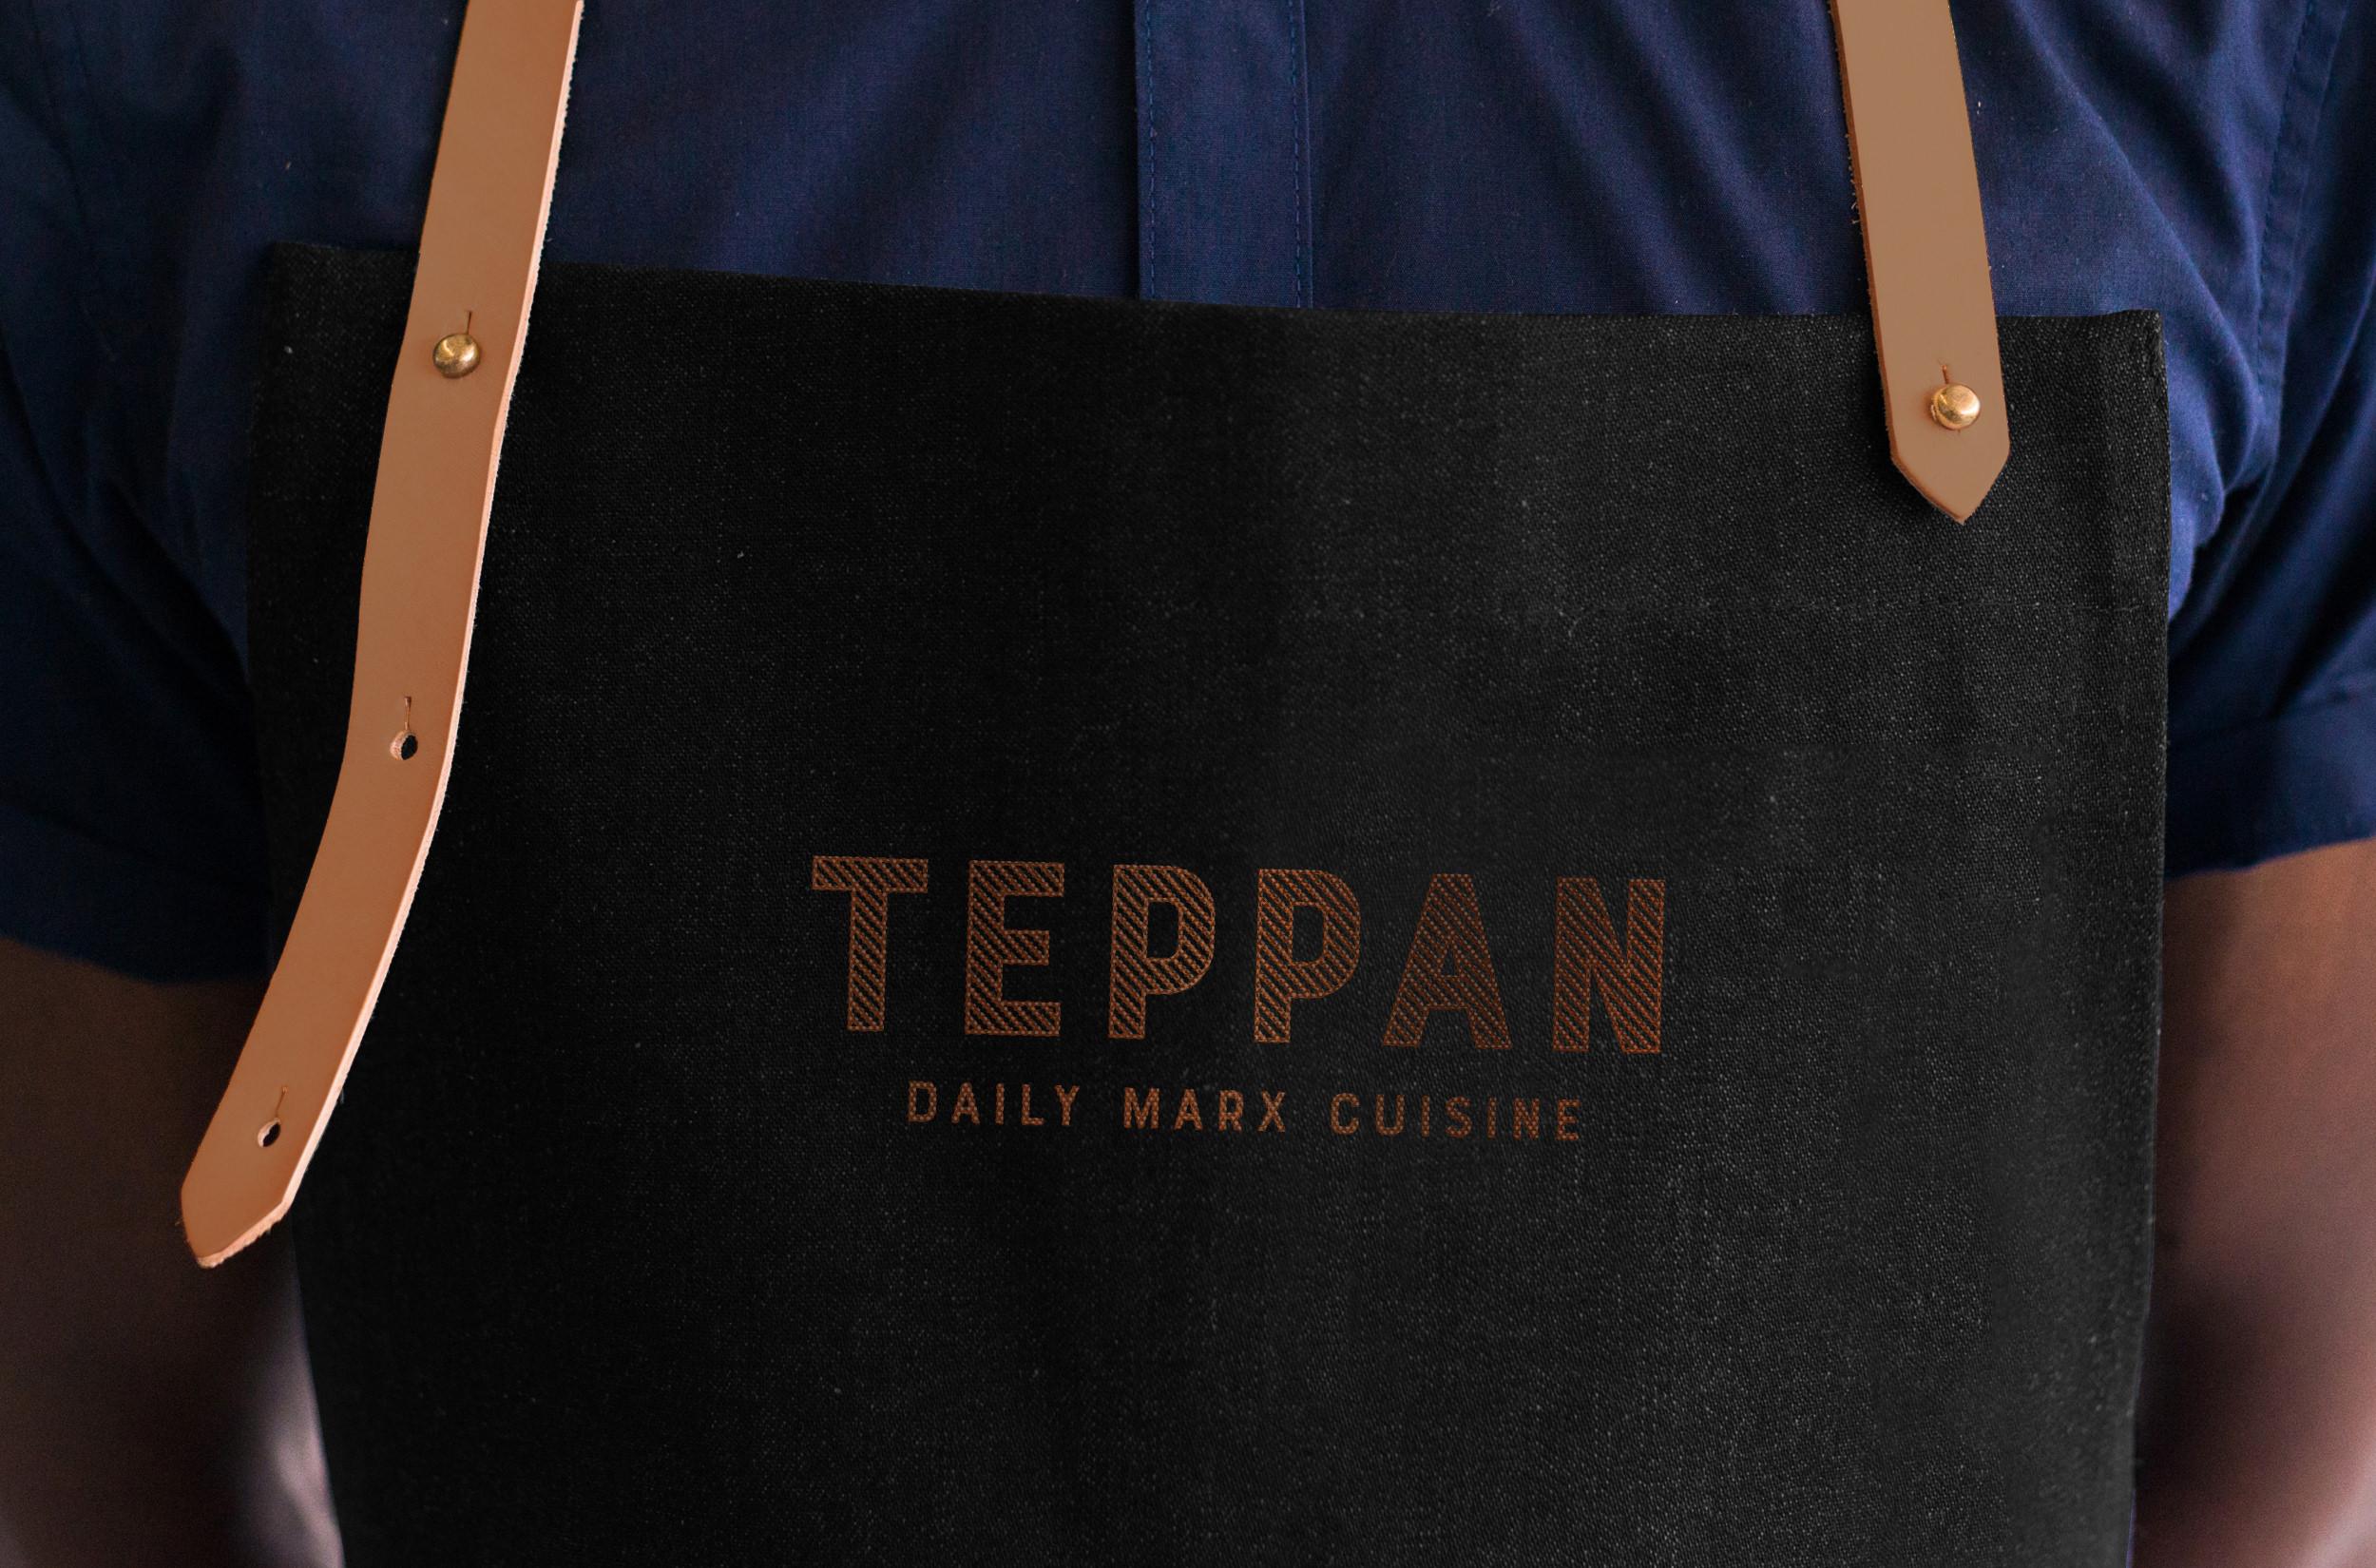 Teppan - 2